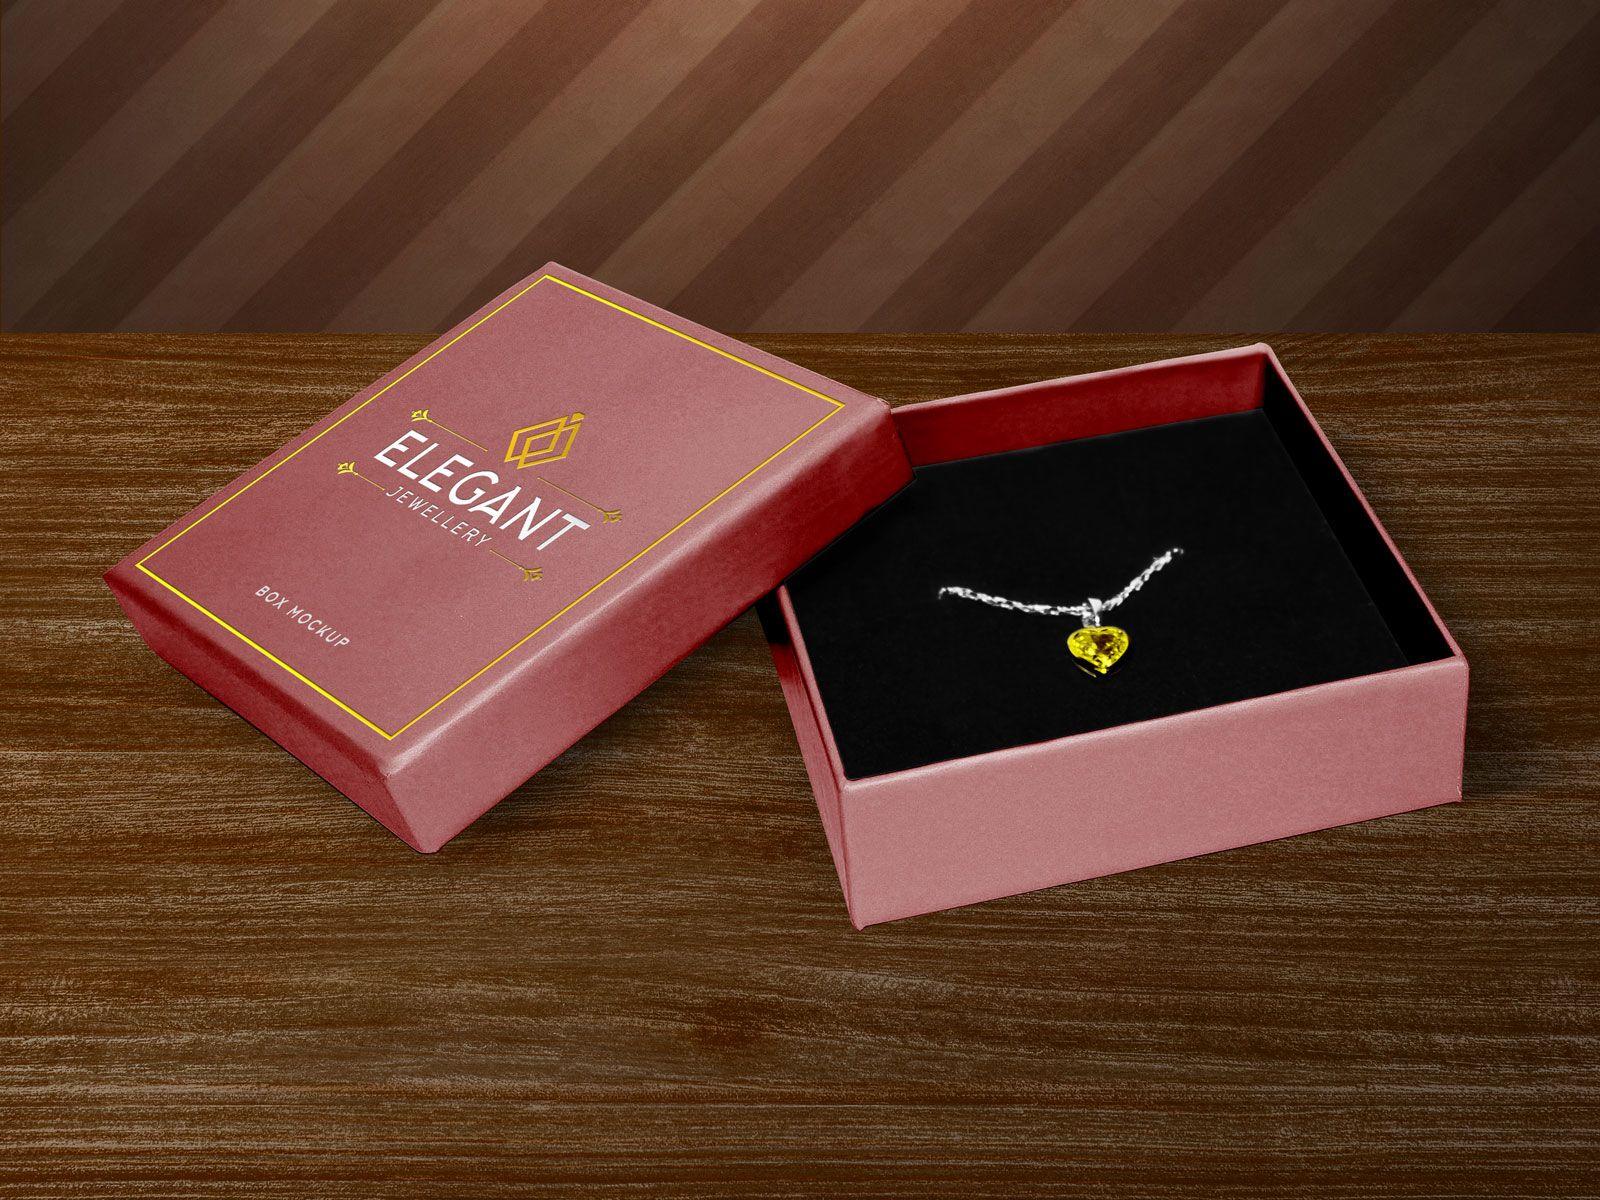 Download Free Jewellery Box Packaging Mockup Psd Packaging Mockup Small Jewelry Box Free Jewelry